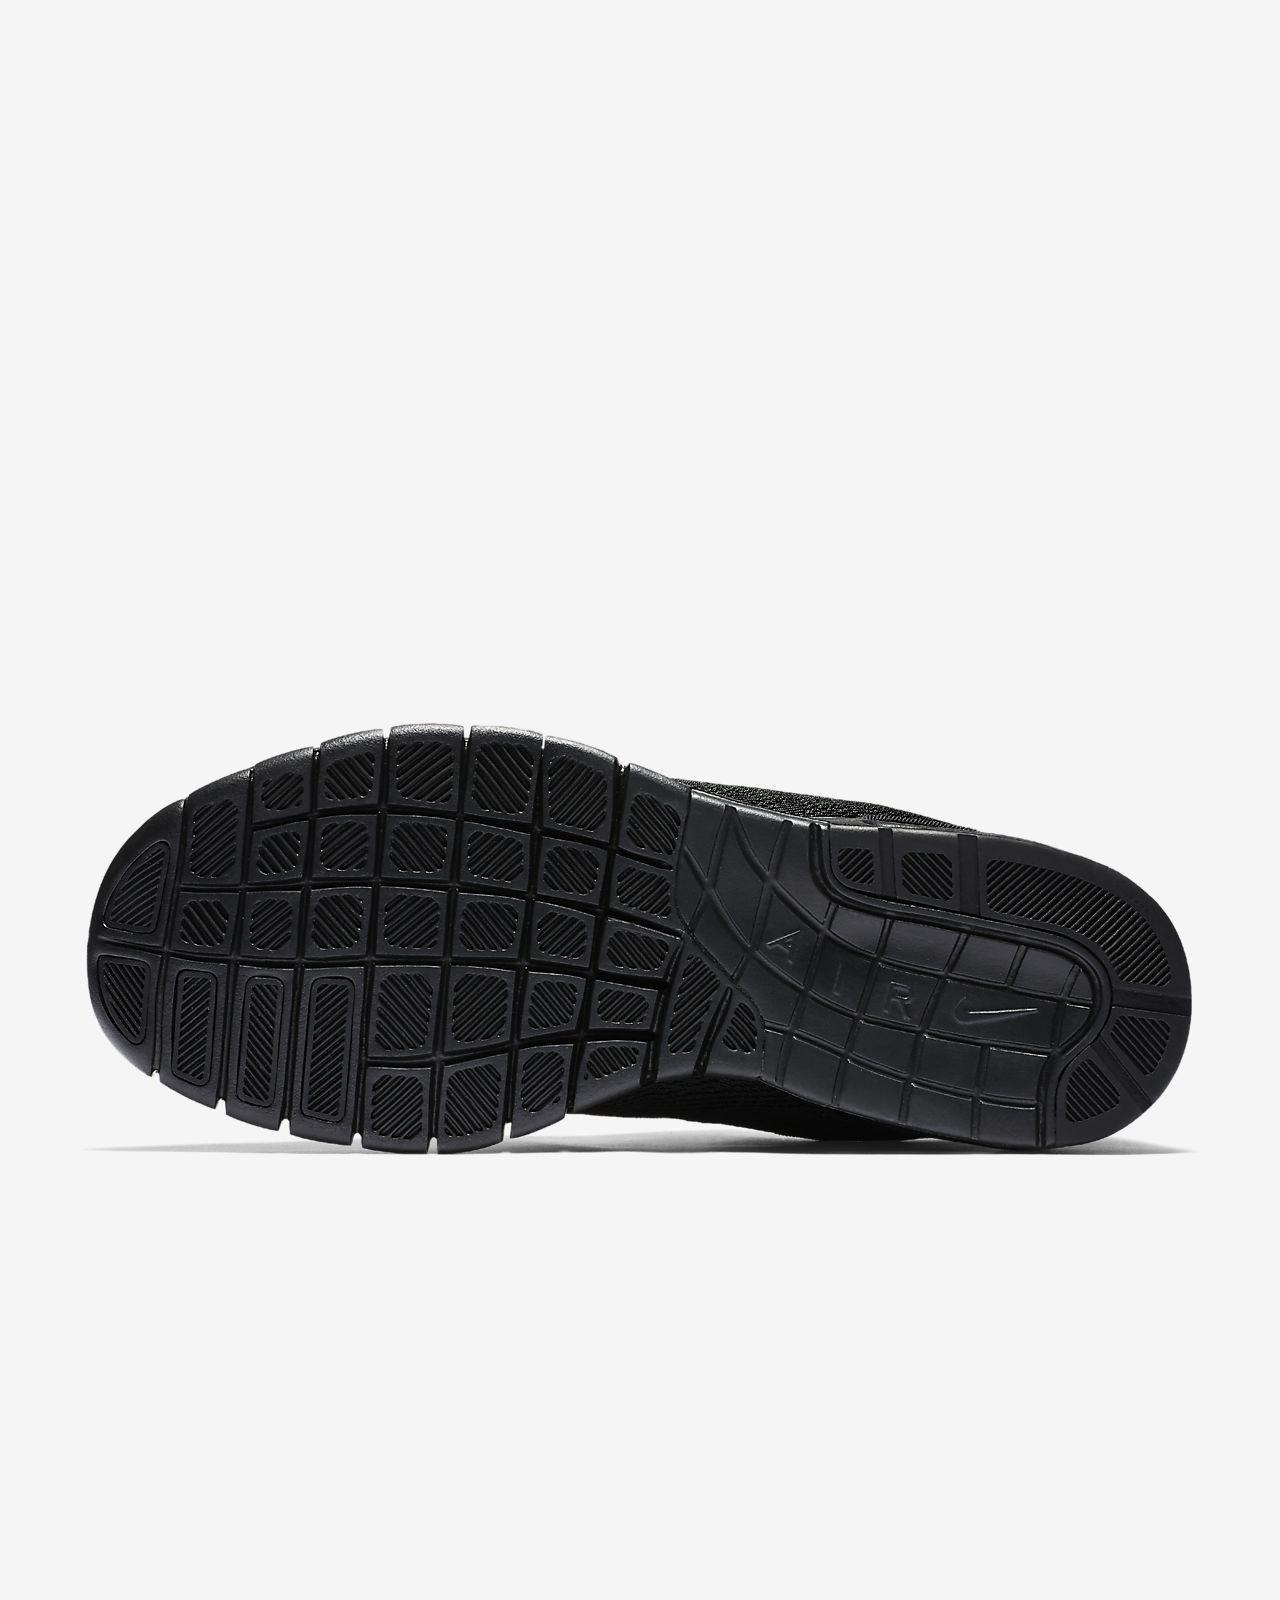 599b9dc903 Nike SB Stefan Janoski Max Skate Shoe. Nike.com